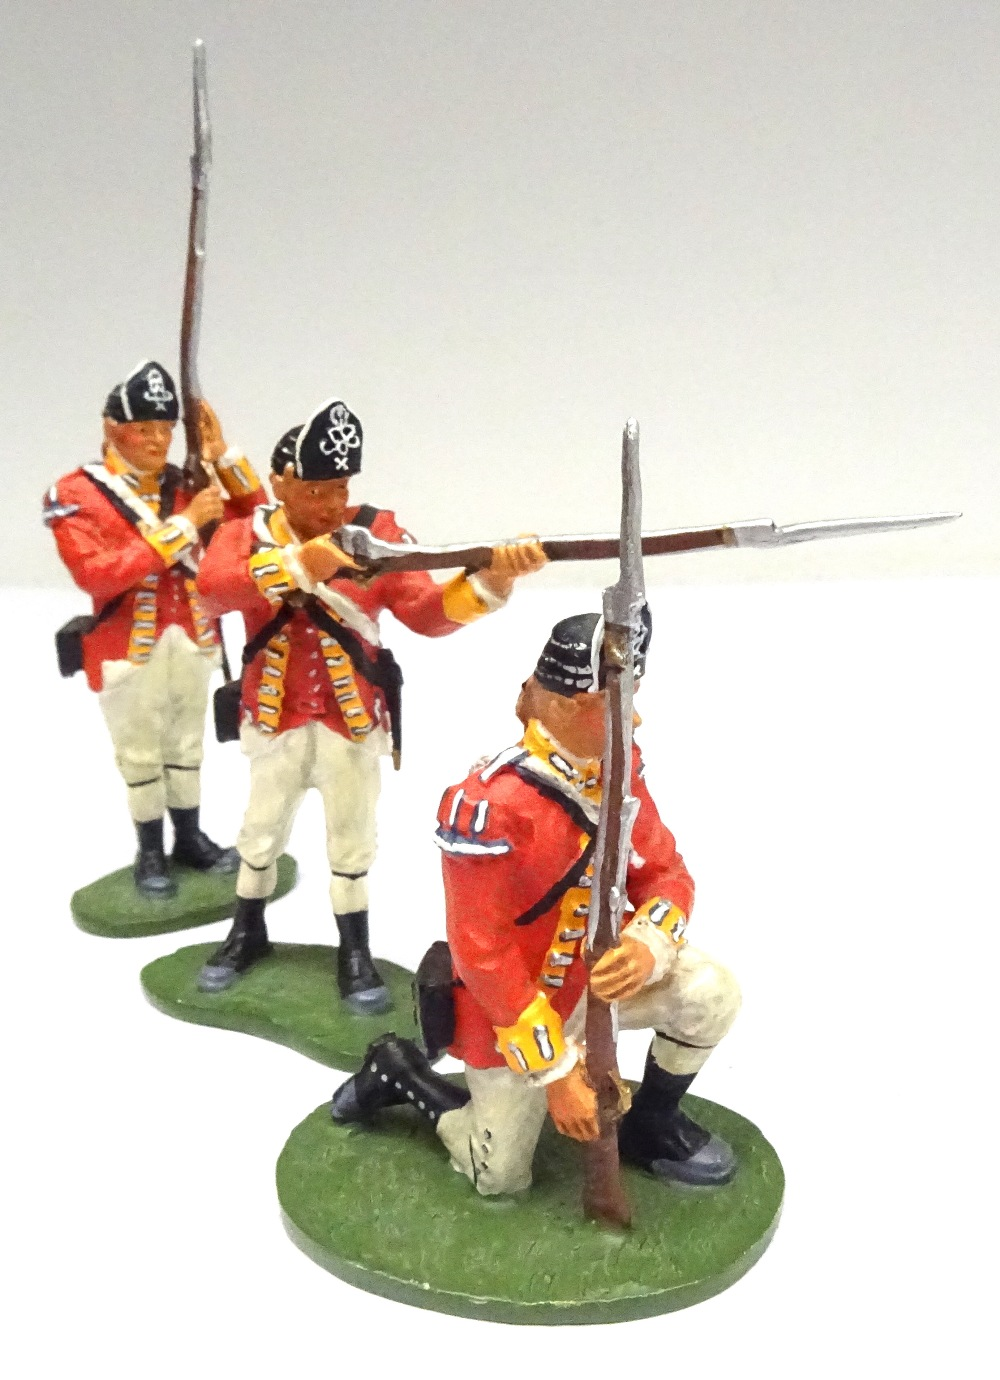 Britains Matte American Revolution set 17221 10th Foot - Image 2 of 9